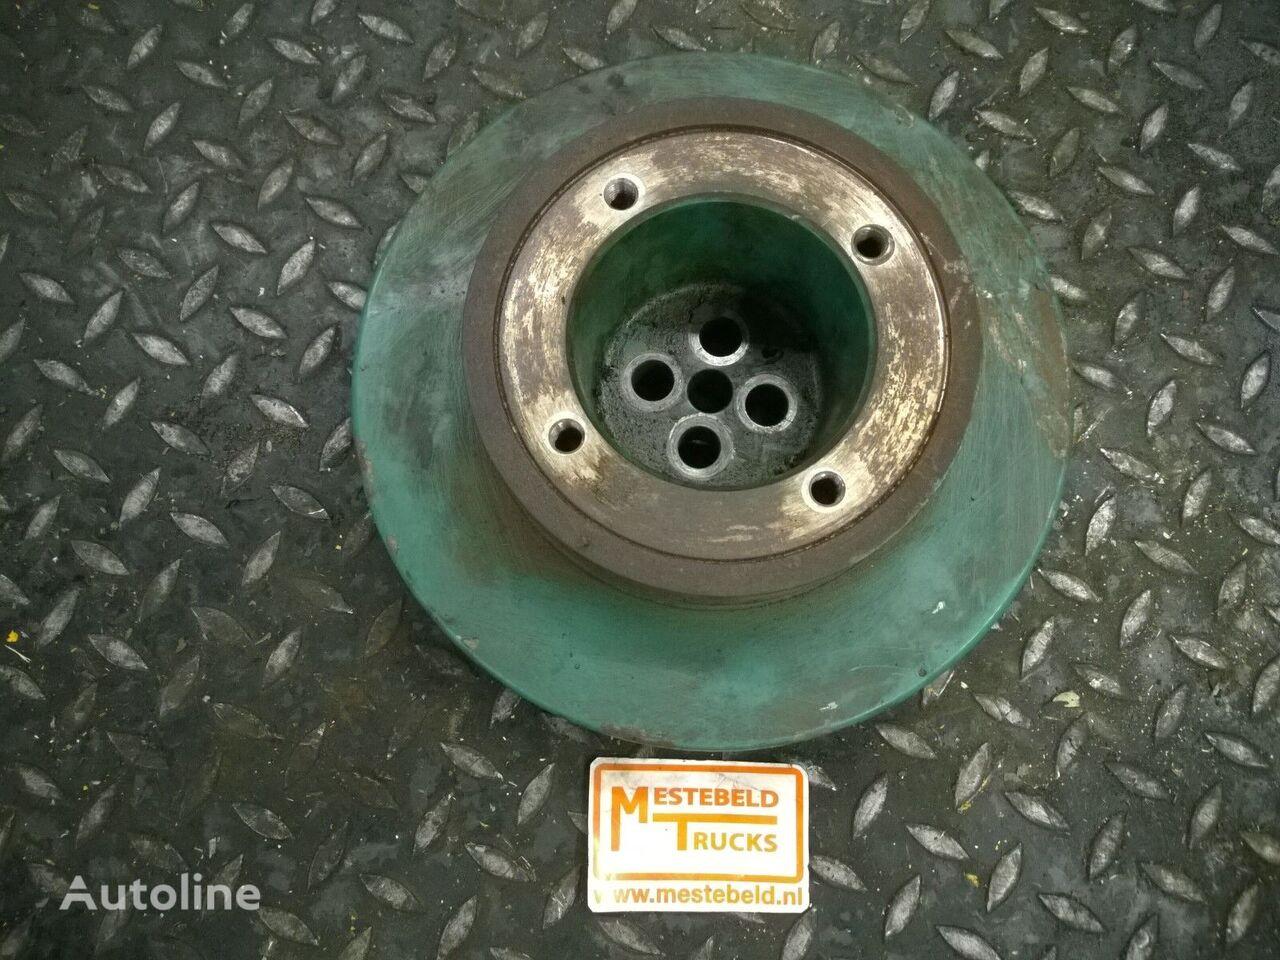 Trillingsdemper/poelie D7E EAE3 VOLVO spare parts for VOLVO truck